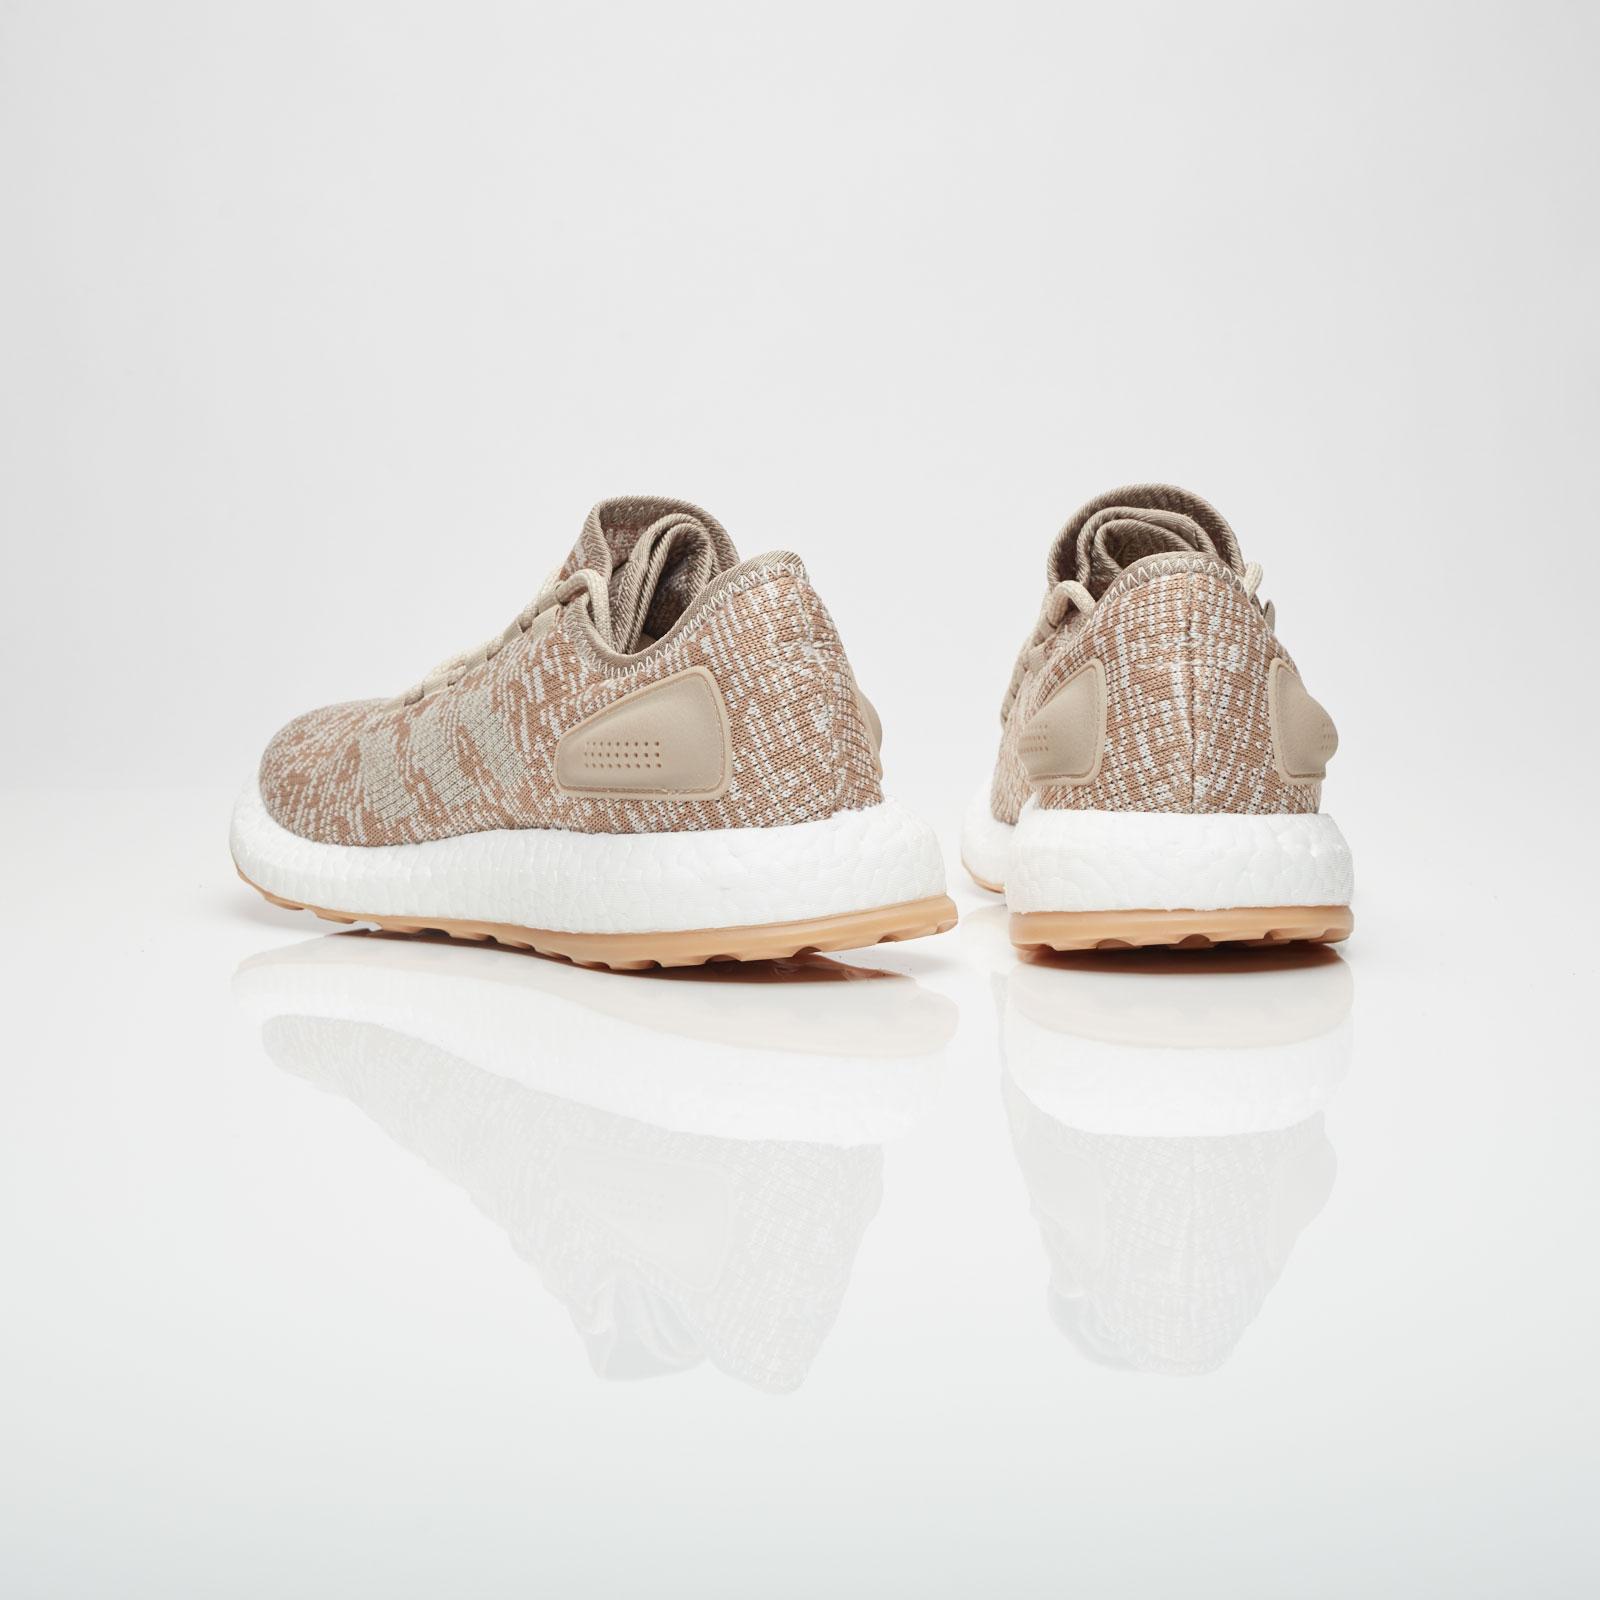 a51596ef28740 adidas PureBOOST - S81992 - Sneakersnstuff